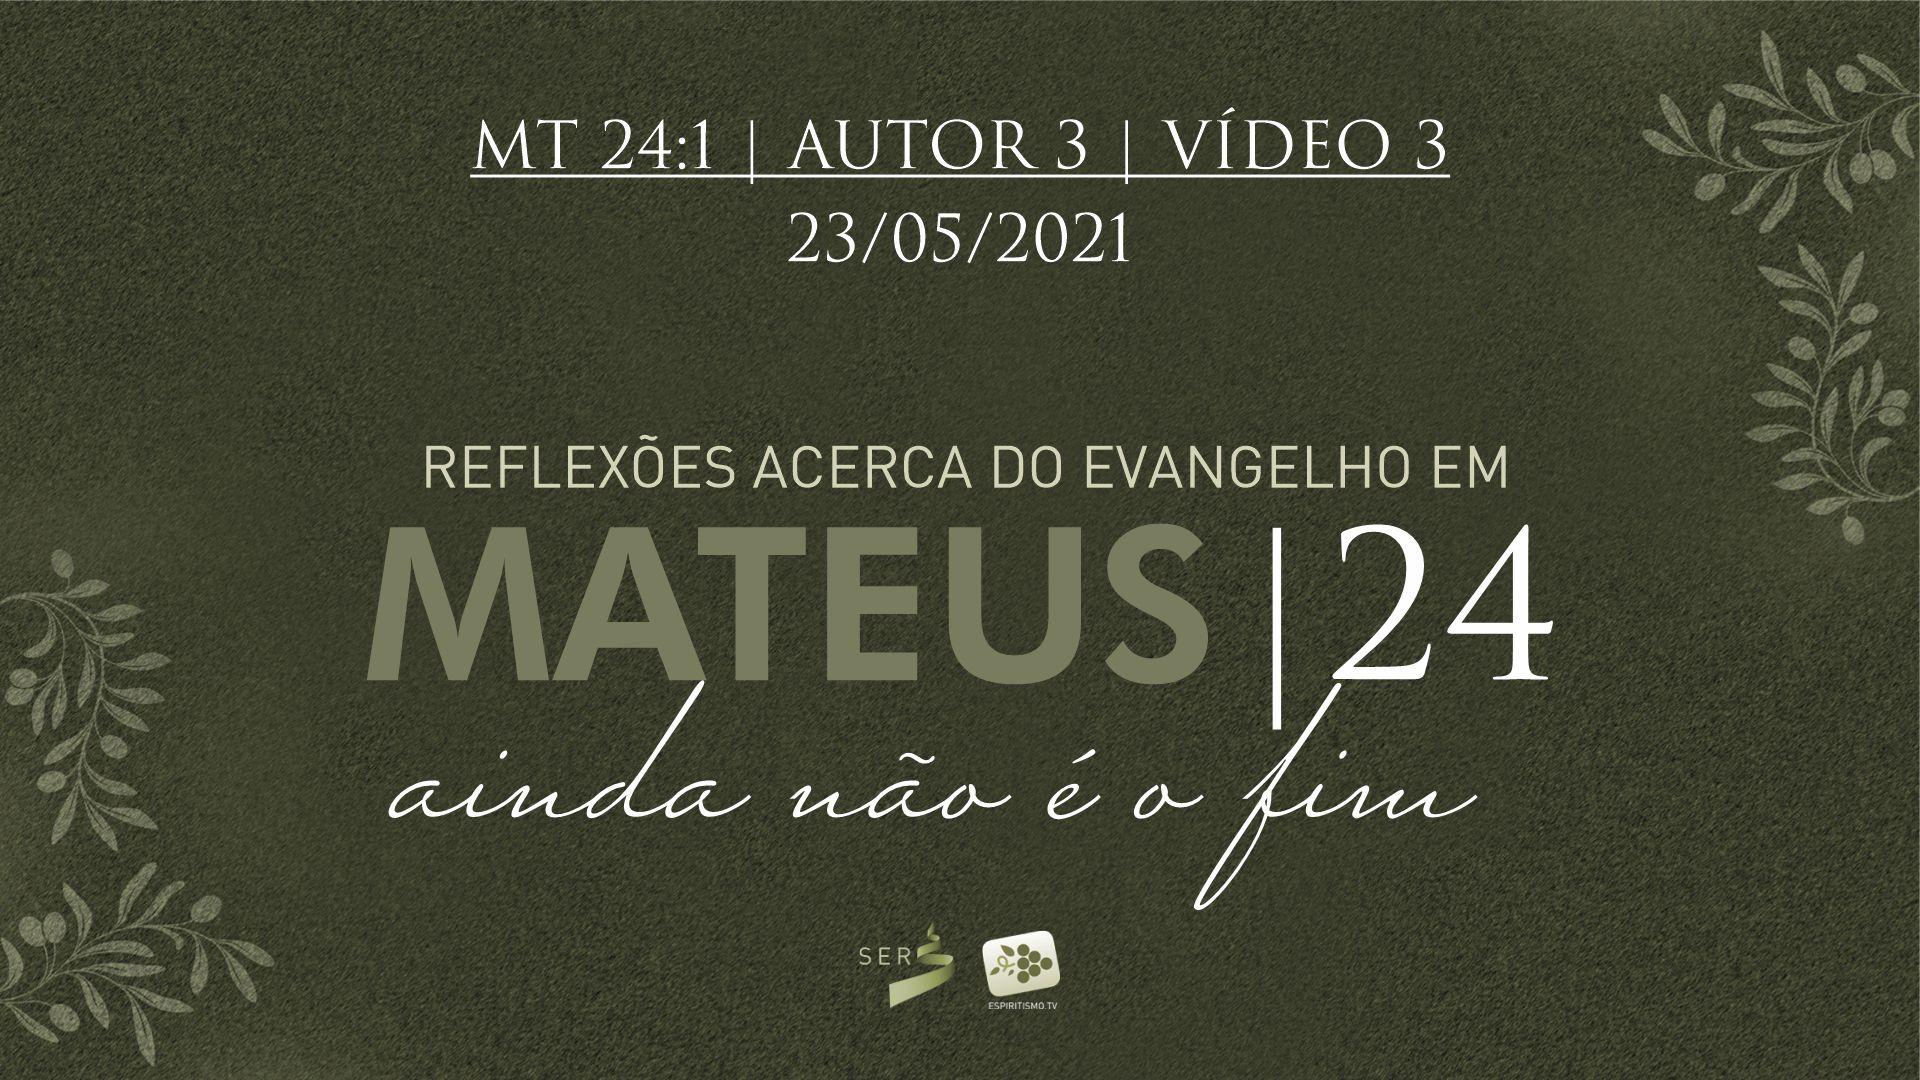 Vídeo | MT24 - AUTOR 3: VIDEO 03